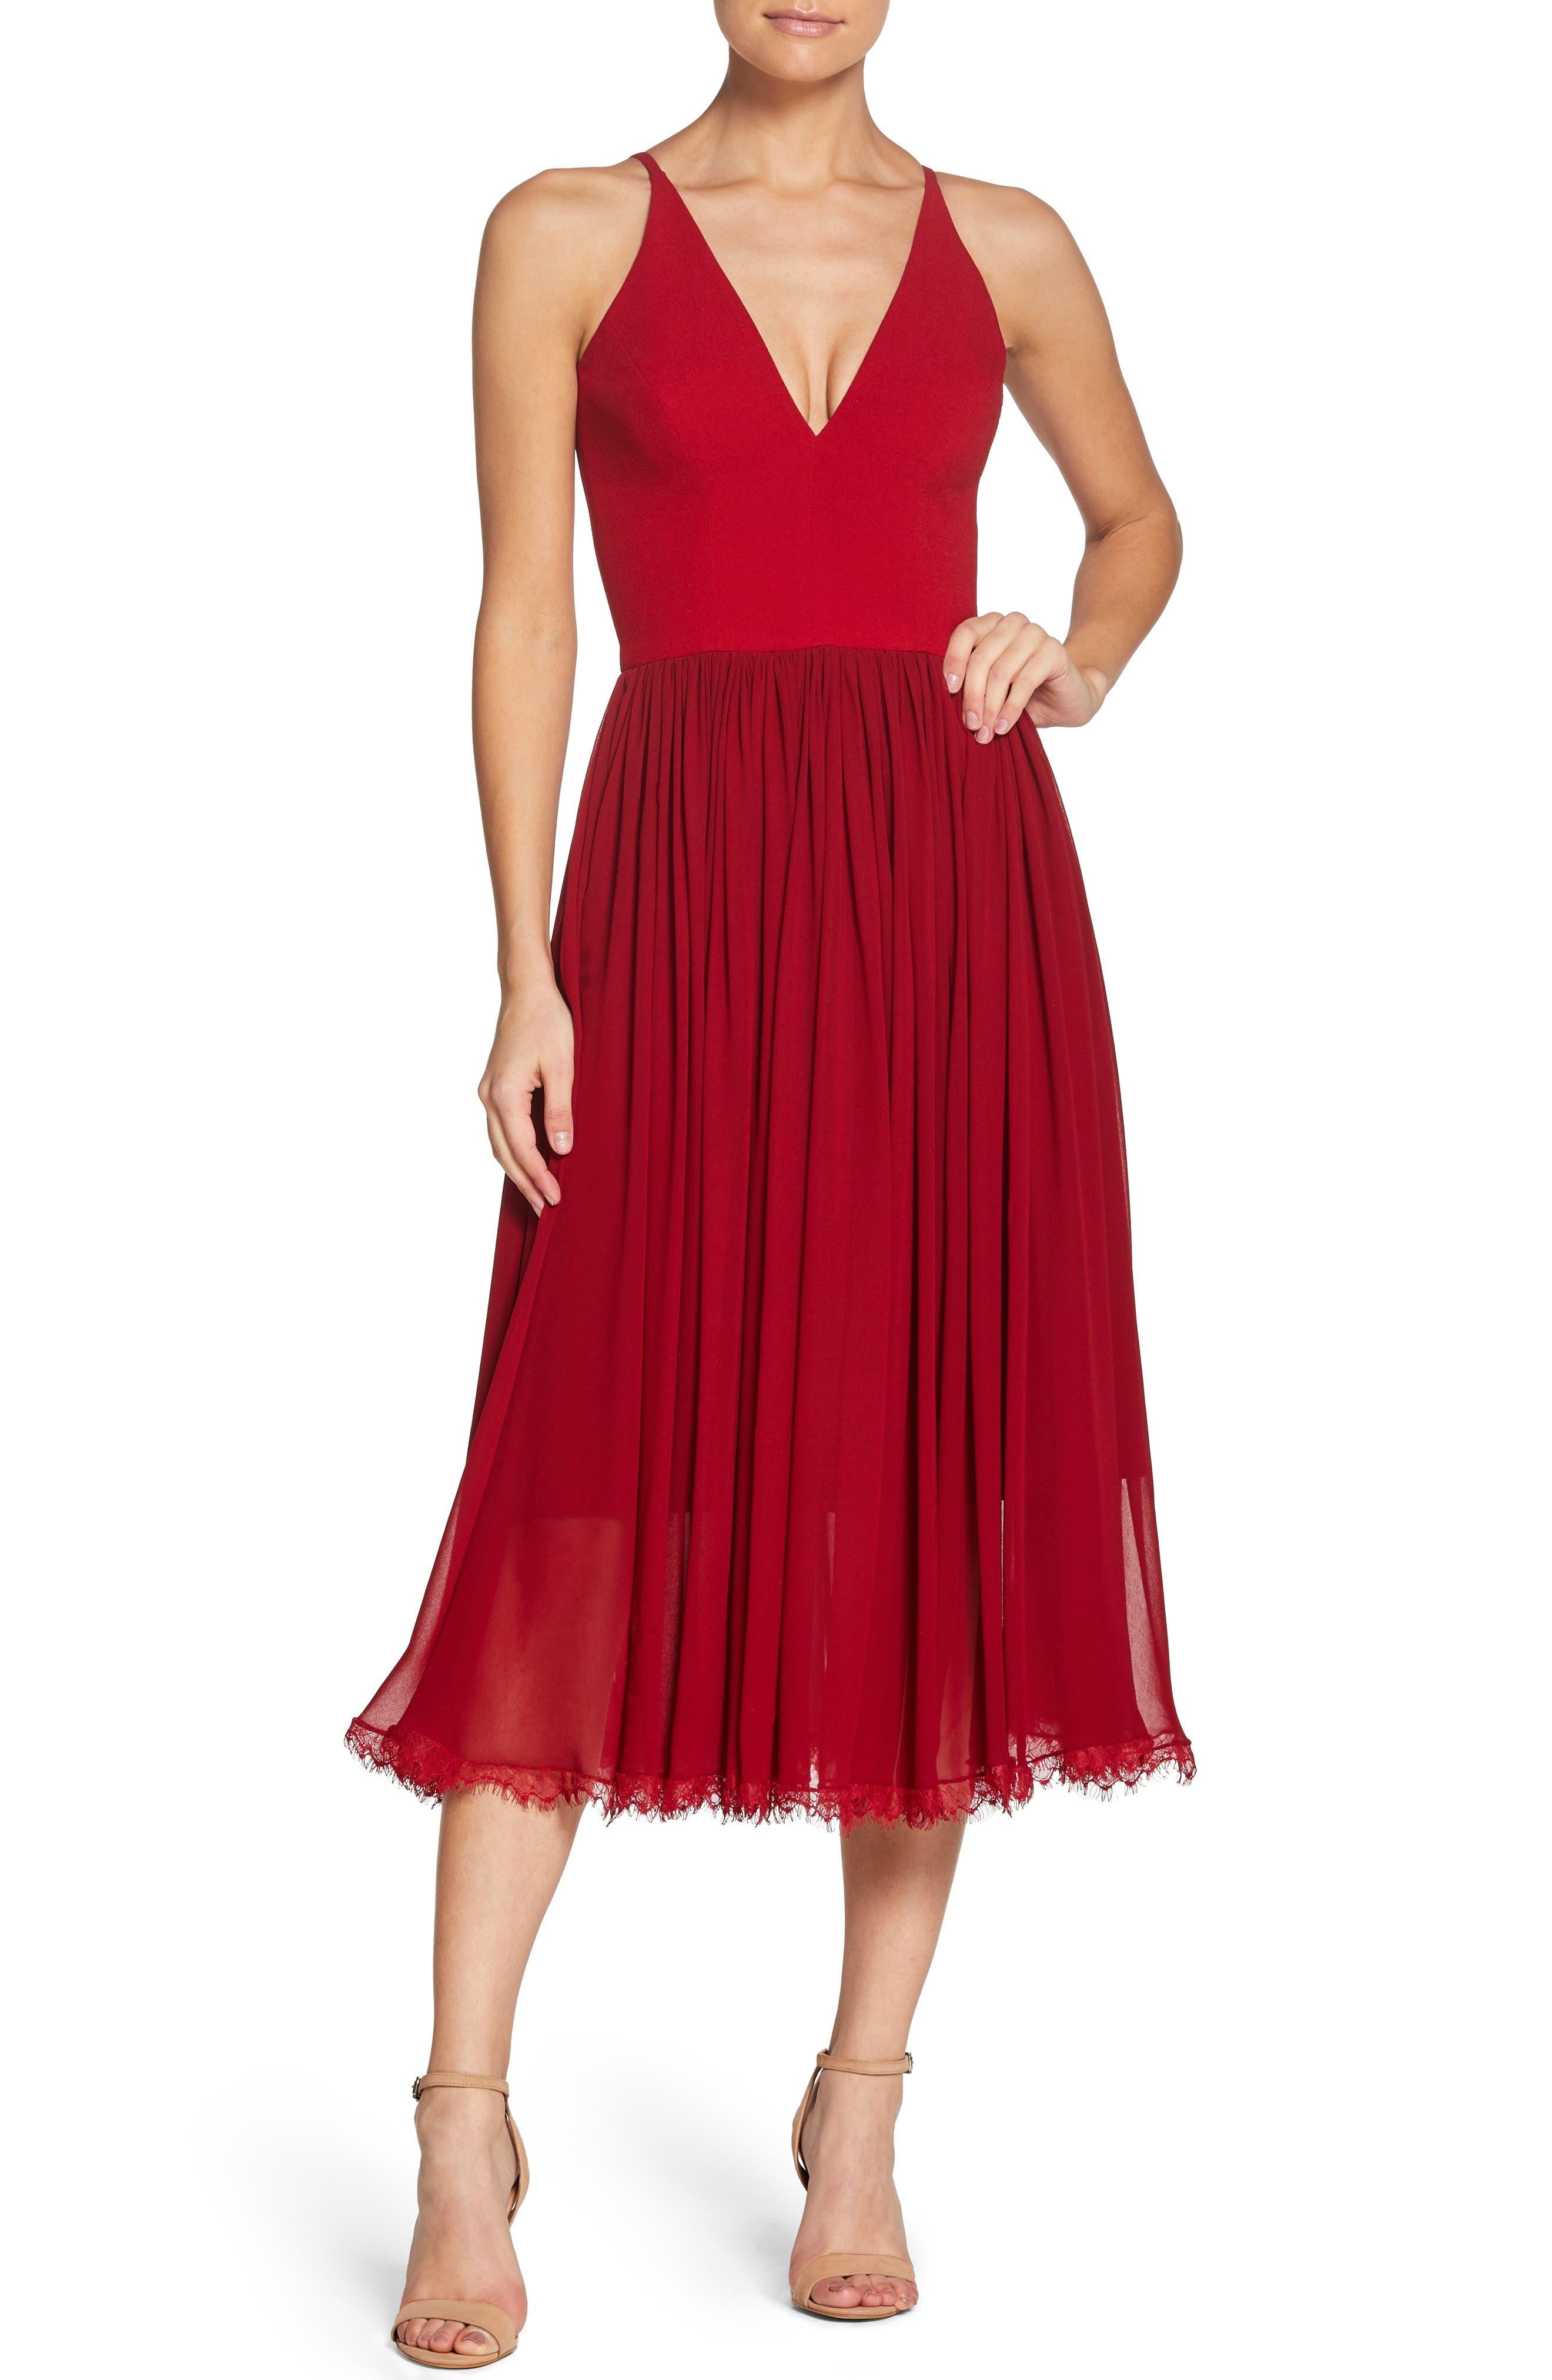 70s Dresses – Disco Dresses, Hippie Dresses, Wrap Dresses Womens Dress The Population Alicia Mixed Media Midi Dress Size Small - Red $198.00 AT vintagedancer.com